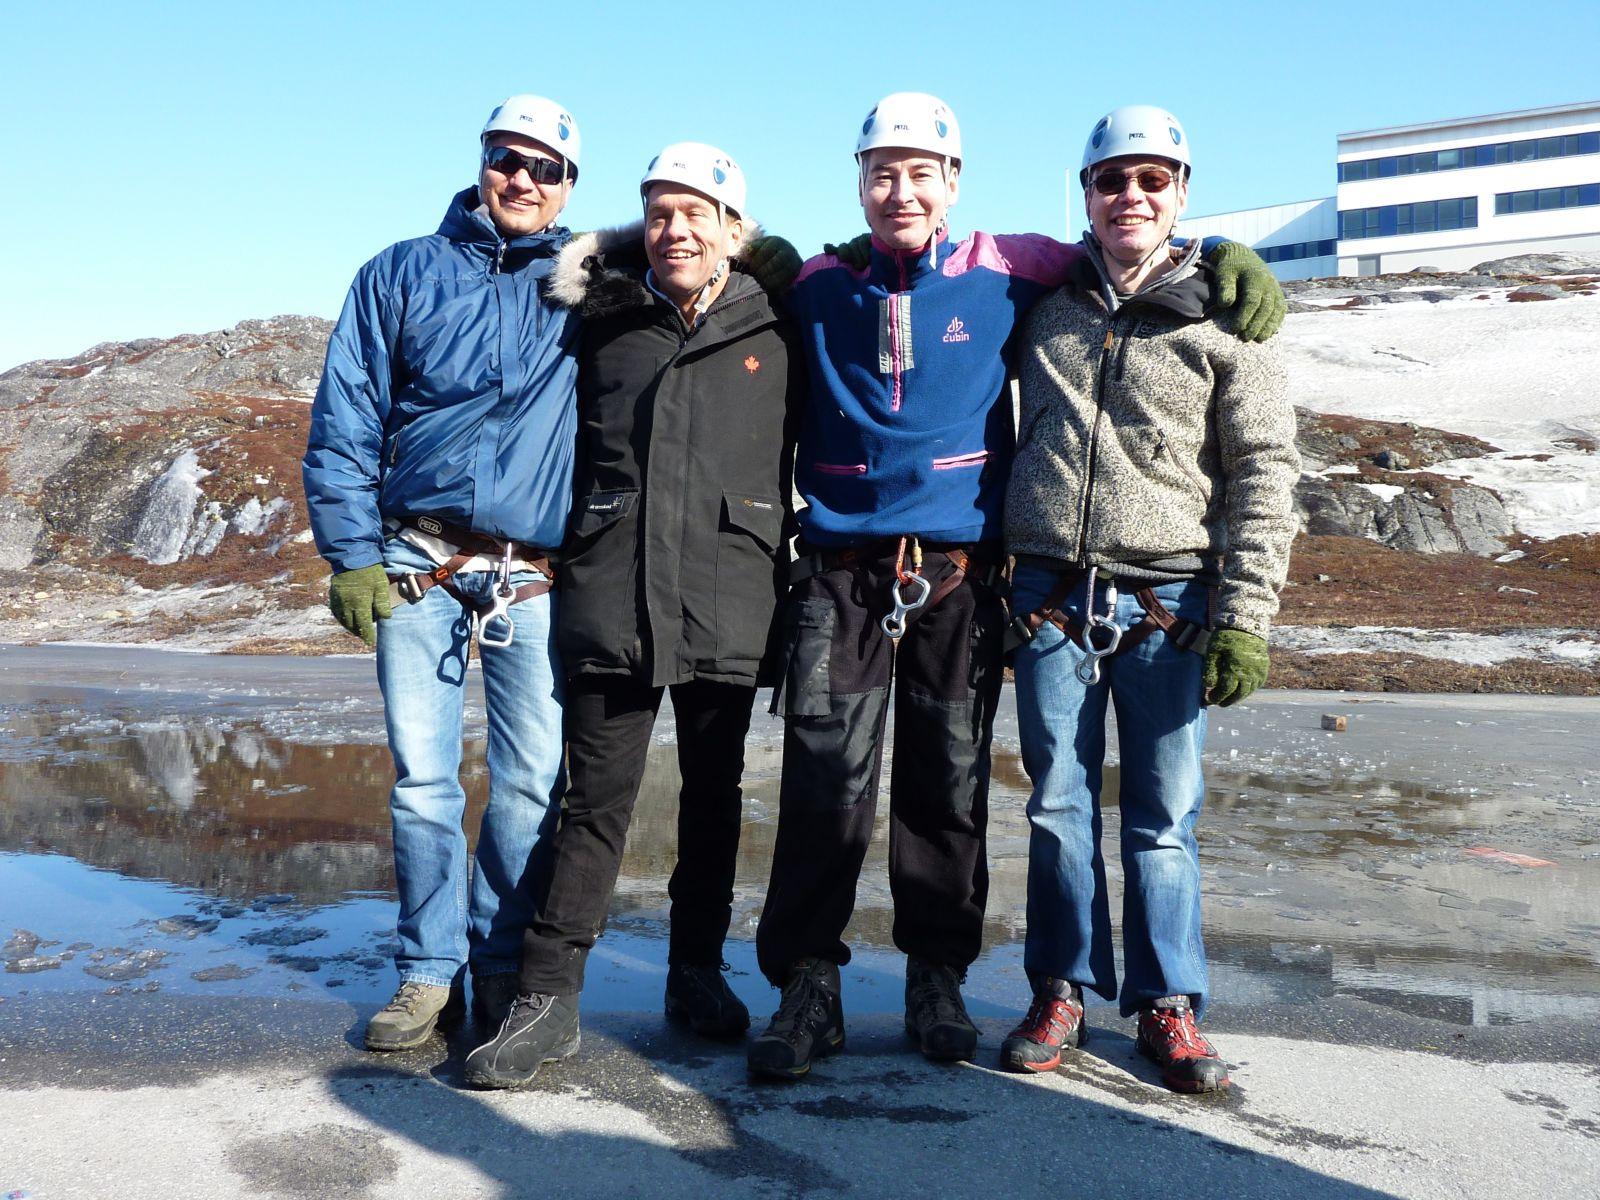 2010-04-10-1614_-_Henrik Steinbacher; Jesper Eugenius Labansen; John Telling; Svend Sværd